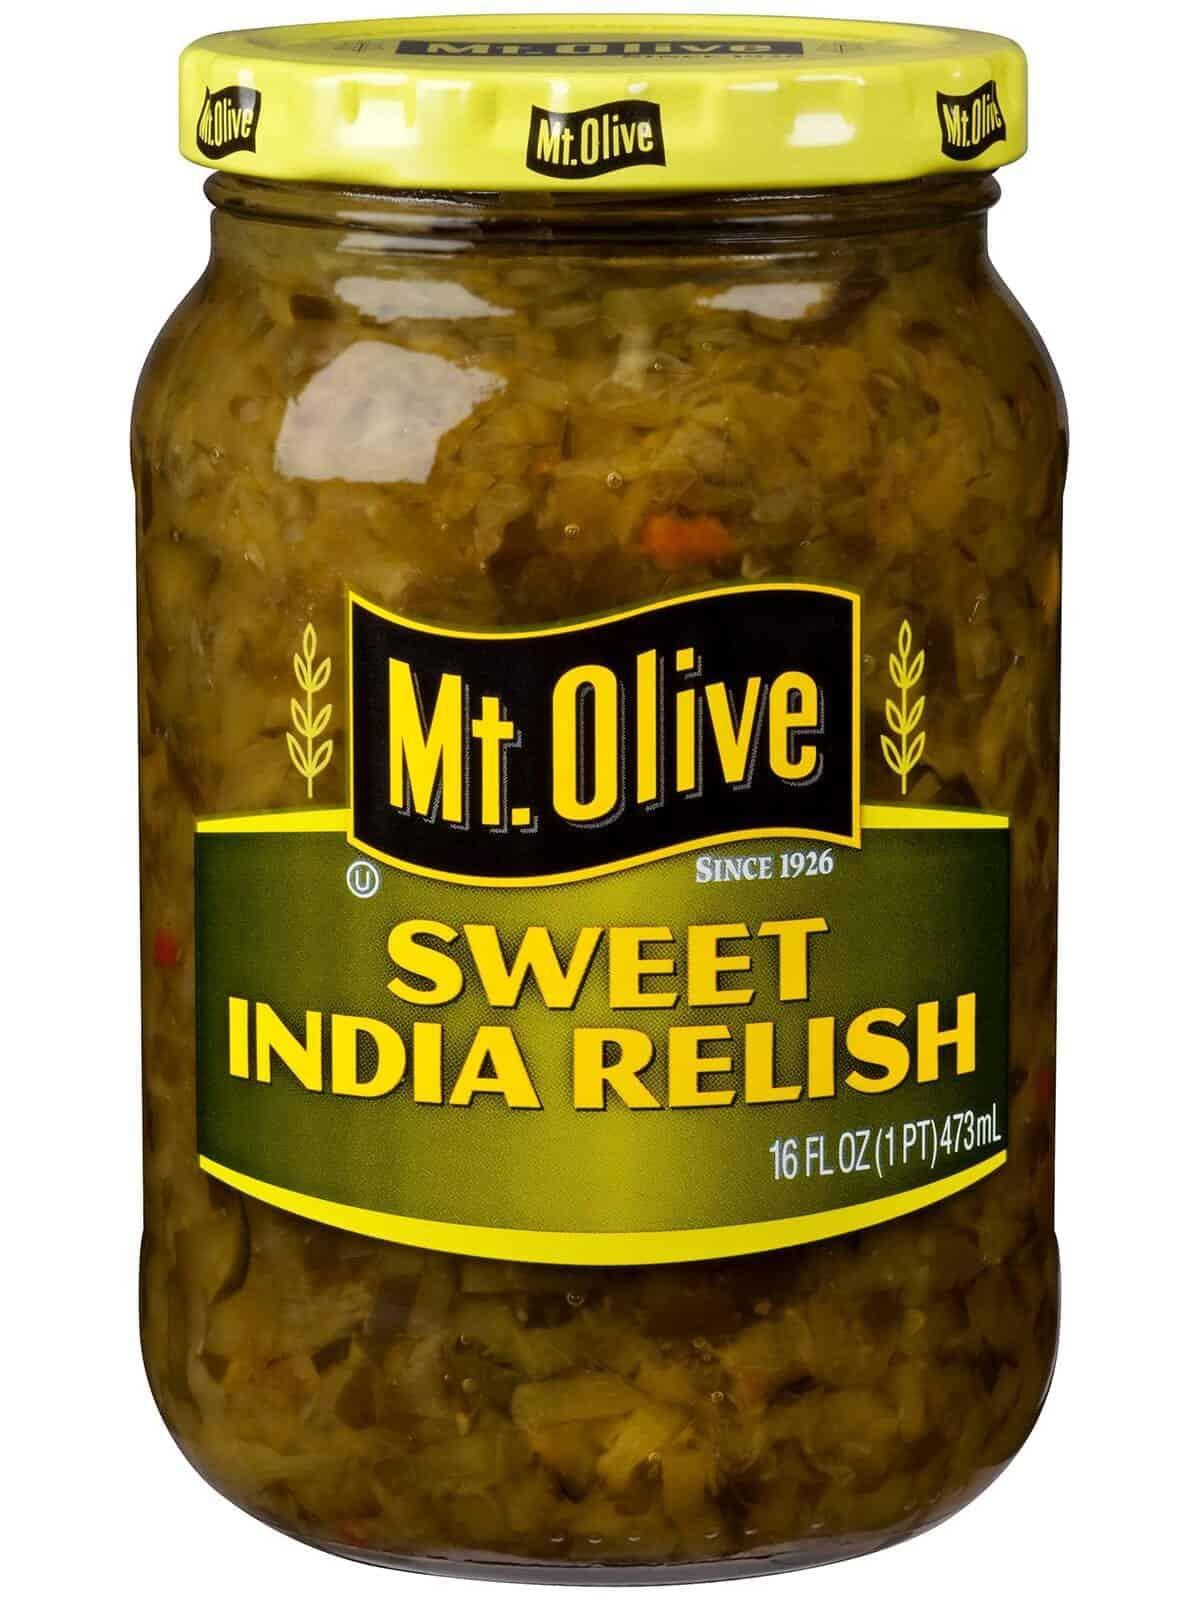 Sweet India Relish